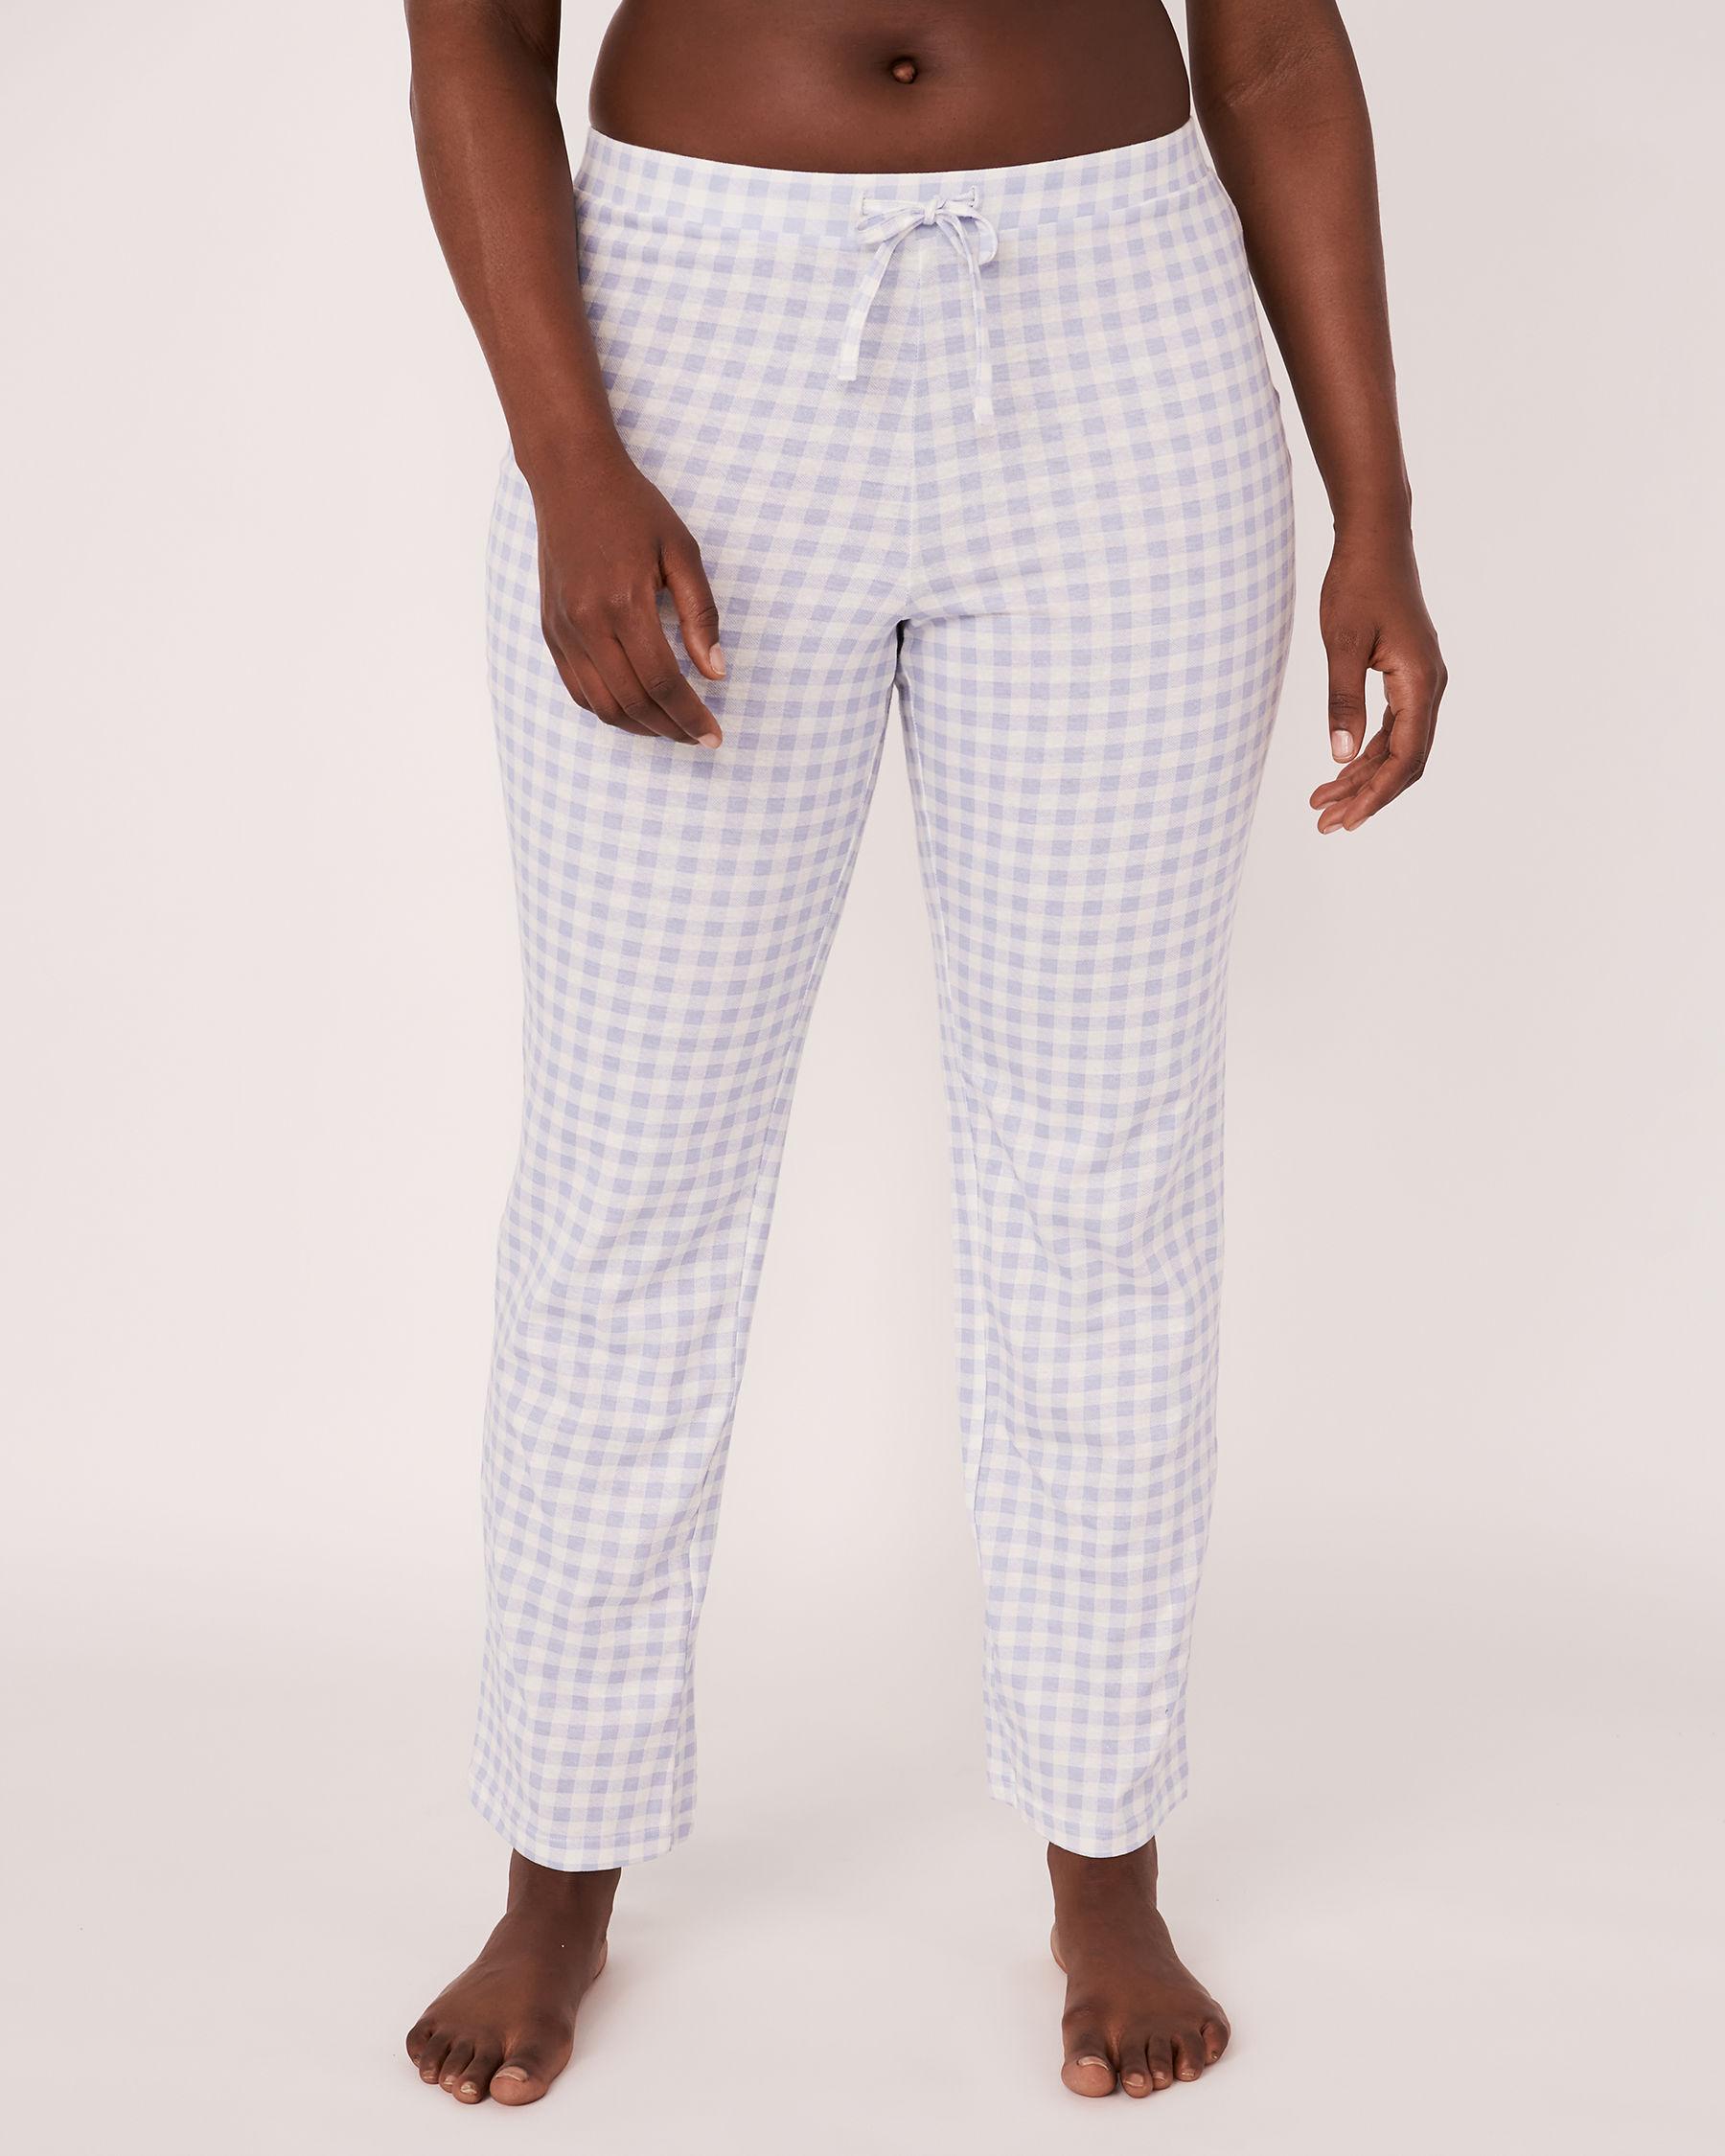 LA VIE EN ROSE Pyjama Pant with Drawstring Blue vichy 40200021 - View1